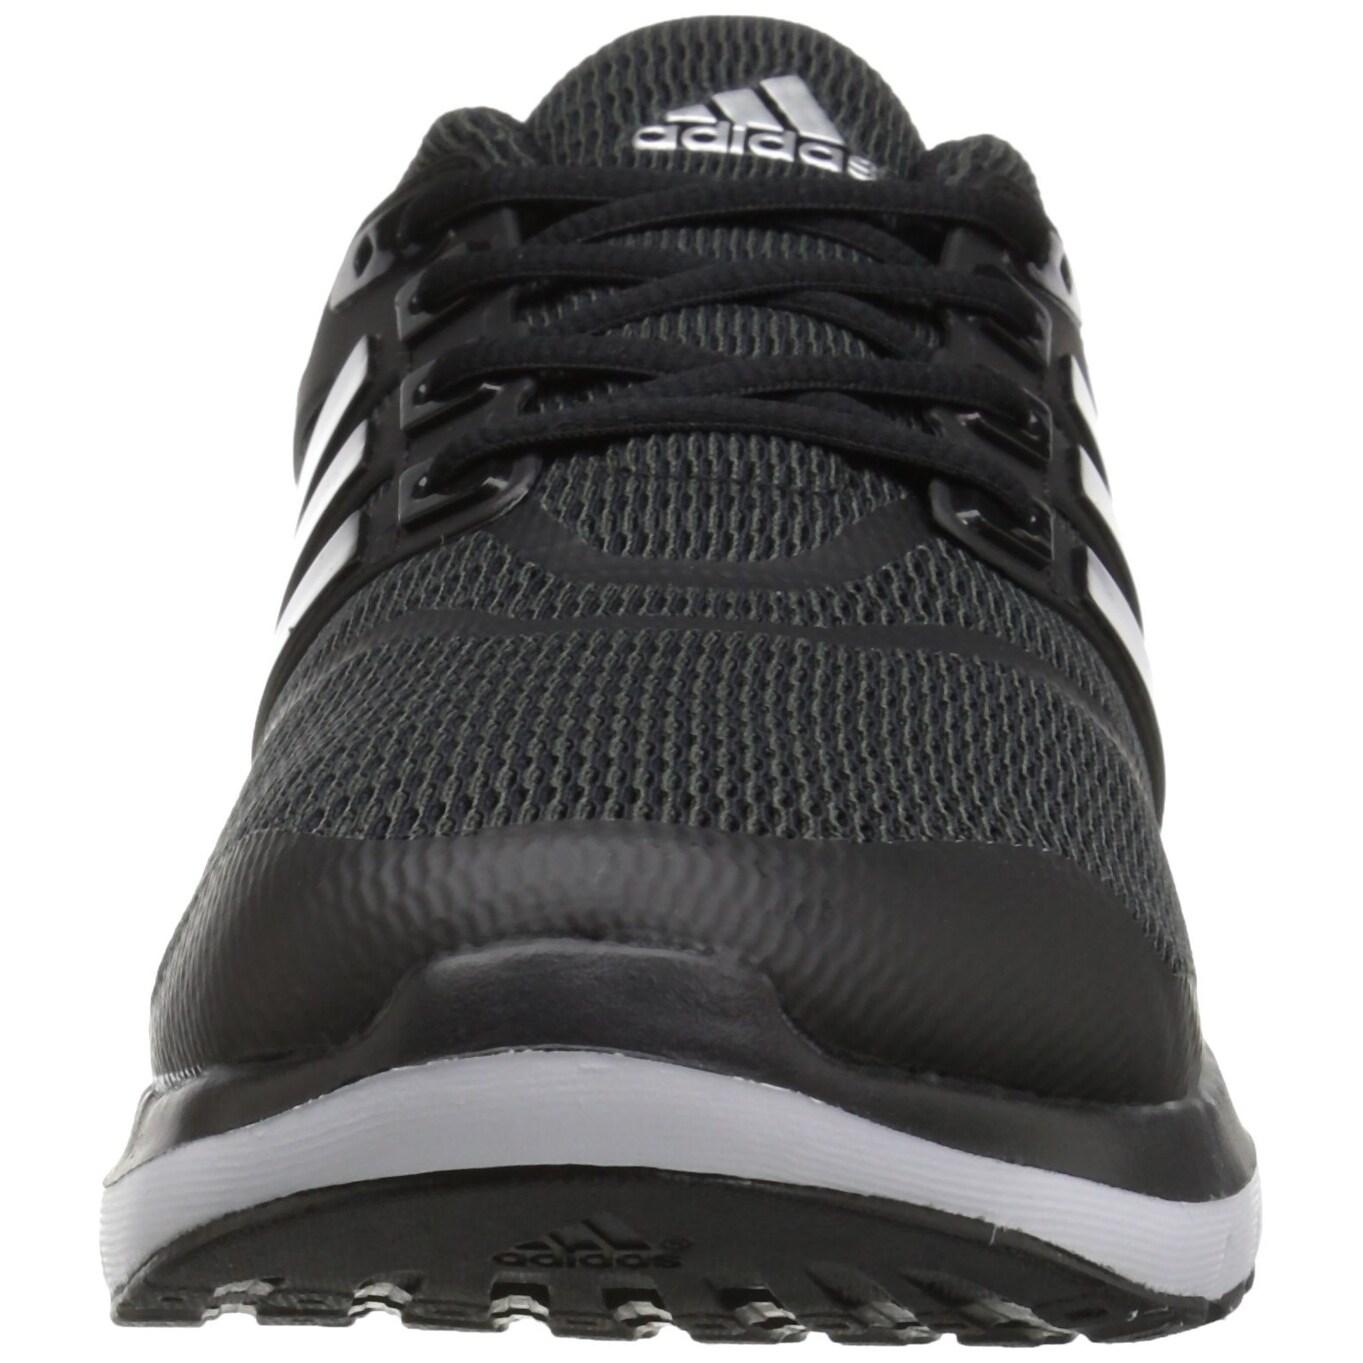 pretty nice c096a 94094 Shop Adidas Performance Womens Energy Cloud V Running Shoe, BlackBlackDark  Grey Heather - blackblackdark grey heather - Free Shipping Today -  Overstock ...